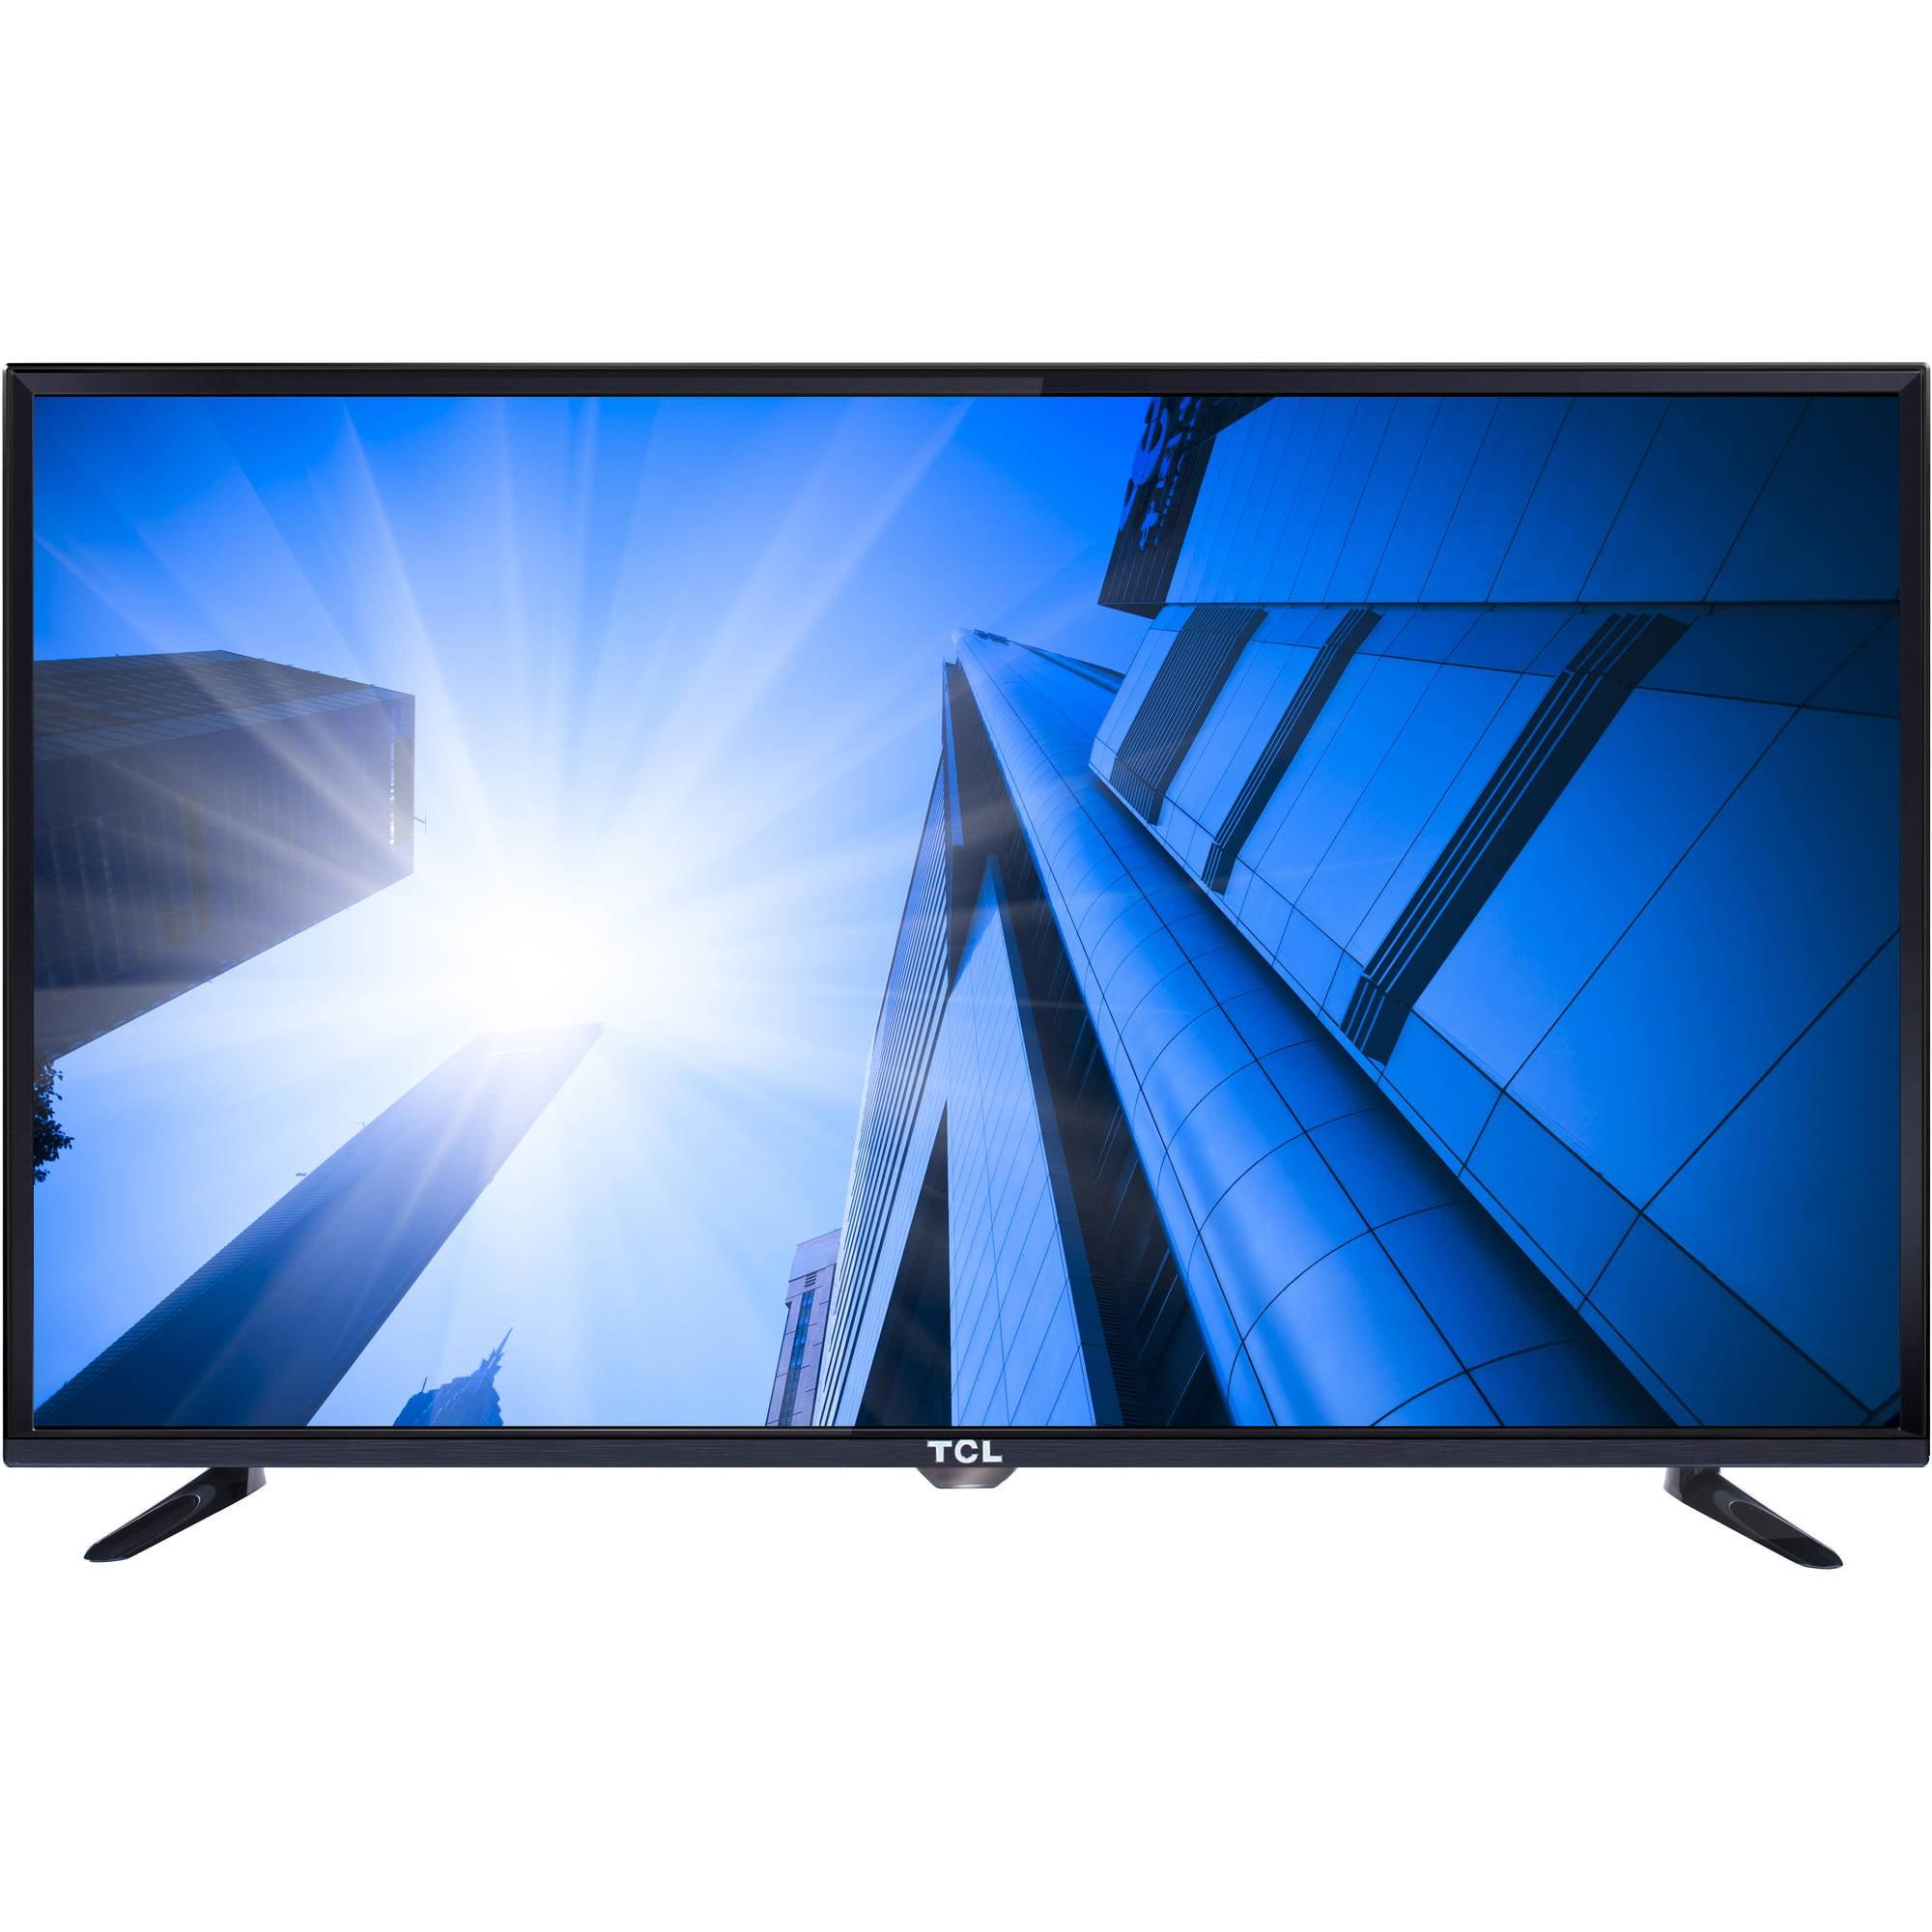 "TCL 32D2700 32"" 720p 60Hz Class LED HDTV"